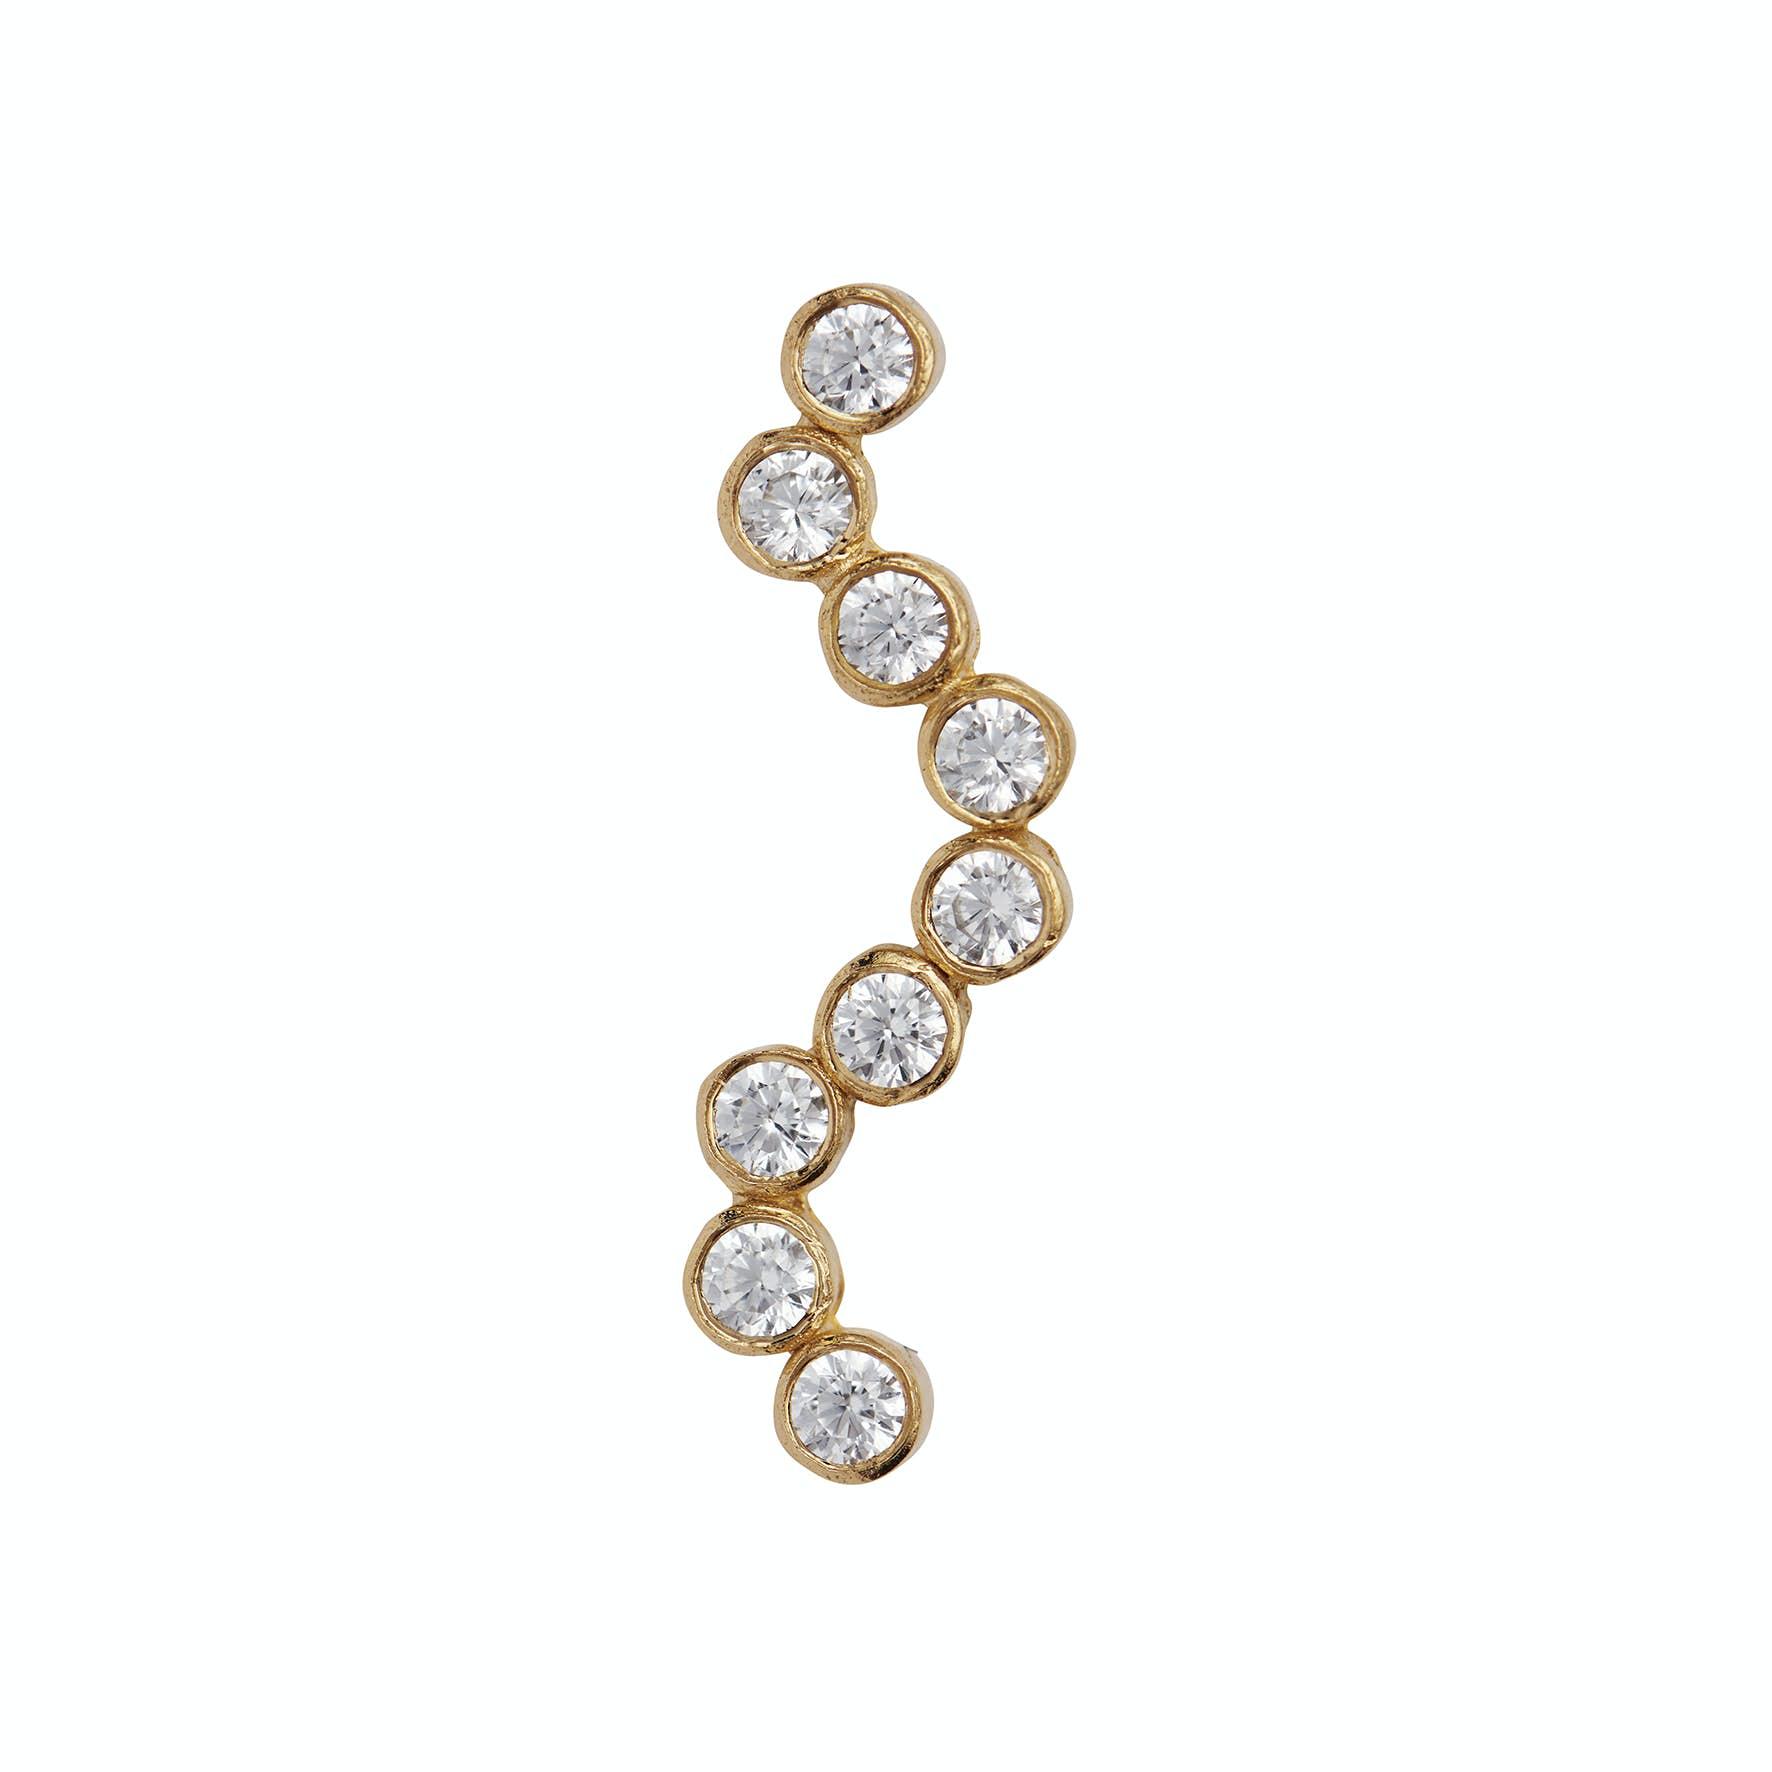 Midnight Sparkle Earring - Right fra STINE A Jewelry i Forgylt-Sølv Sterling 925